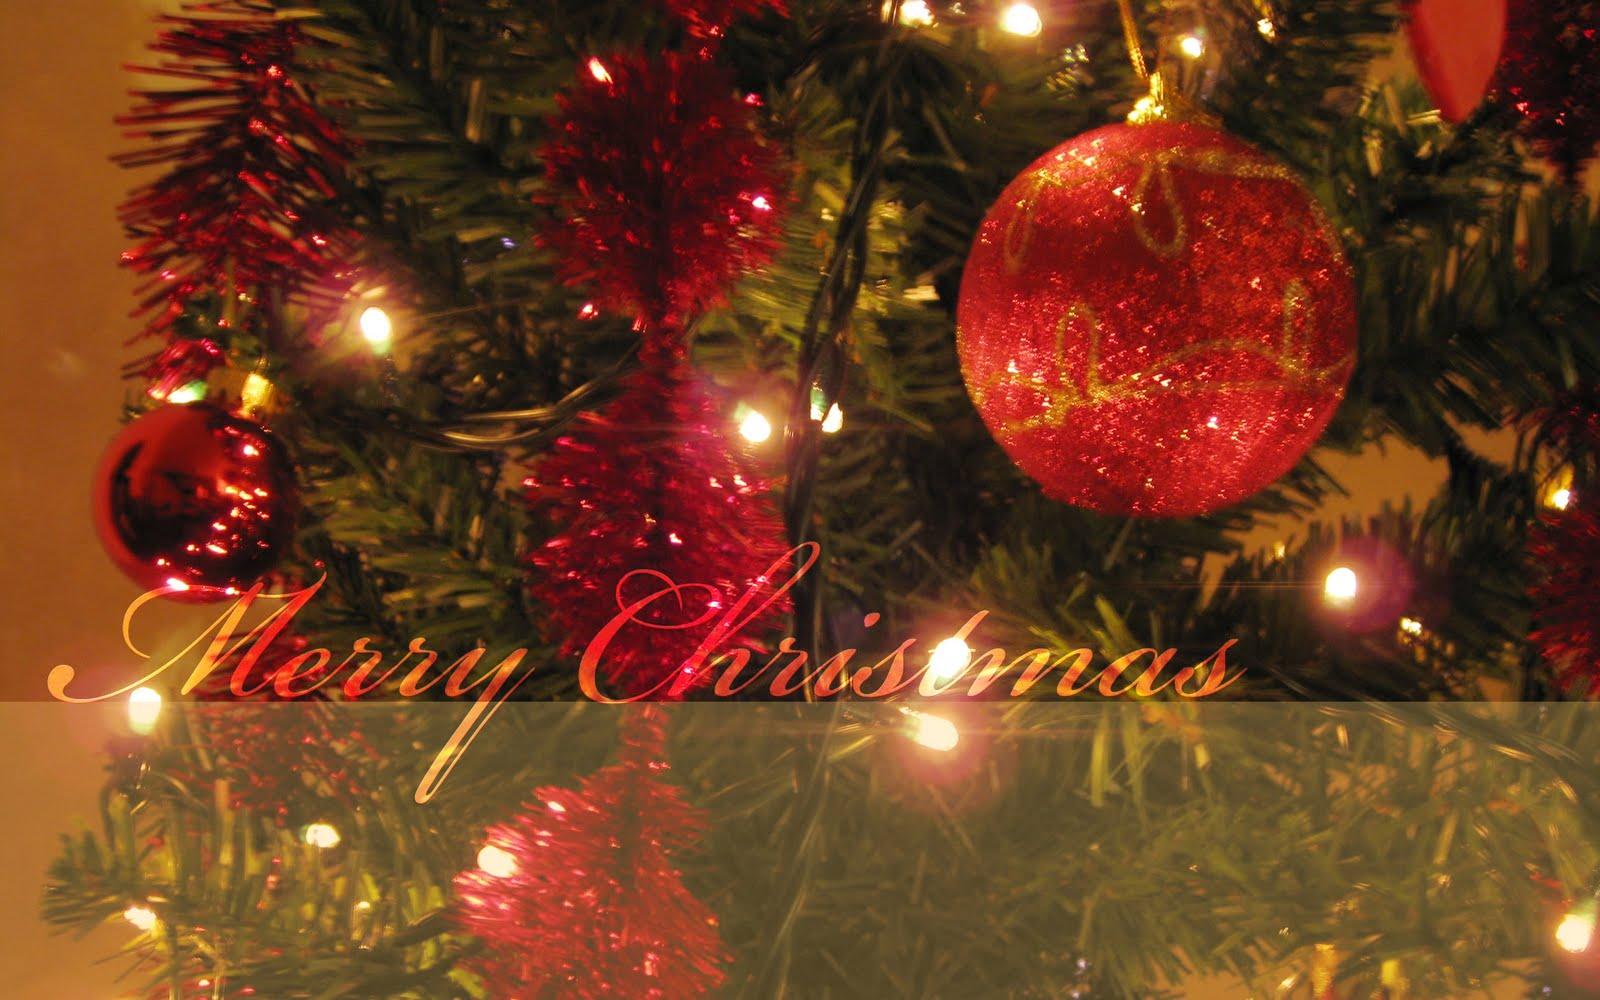 ... christmas wallpapers free,christmas wallpapers and screensavers